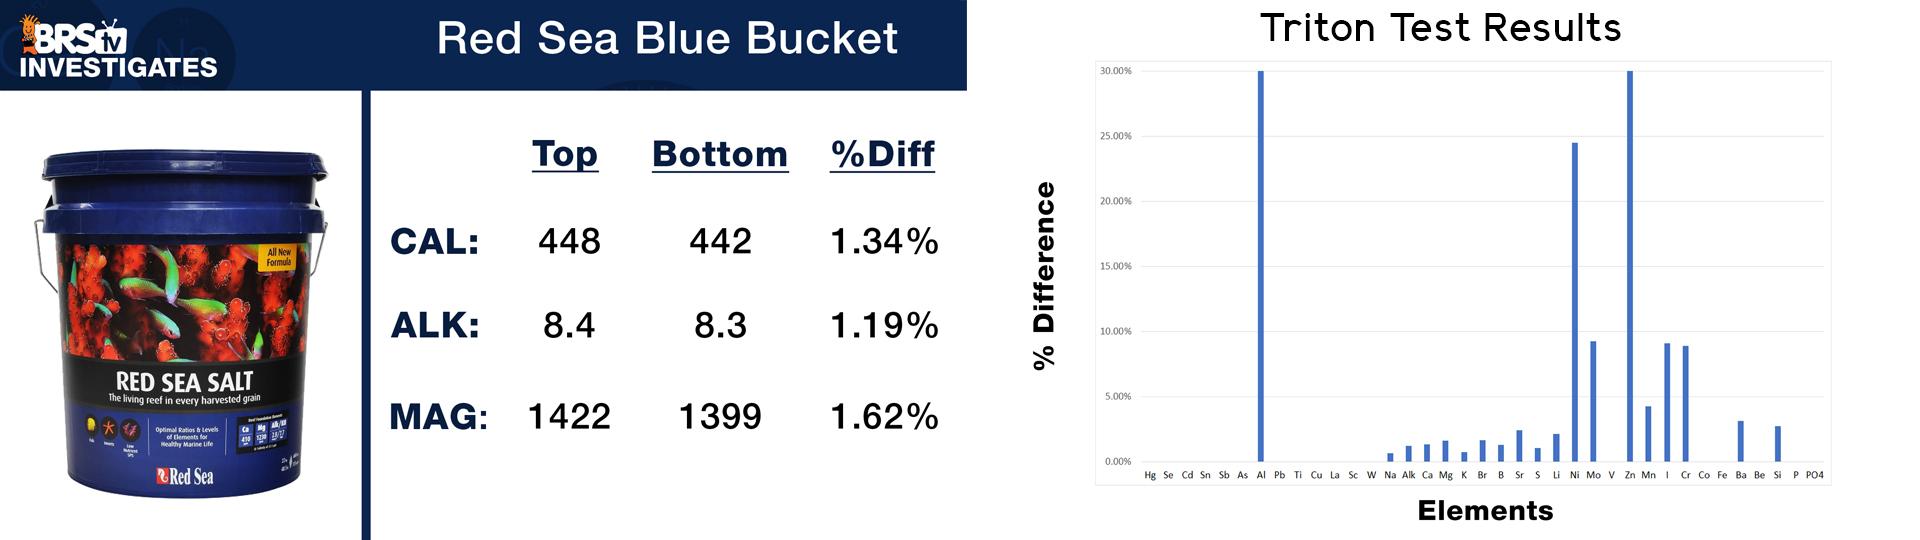 Red Sea Blue Bucket